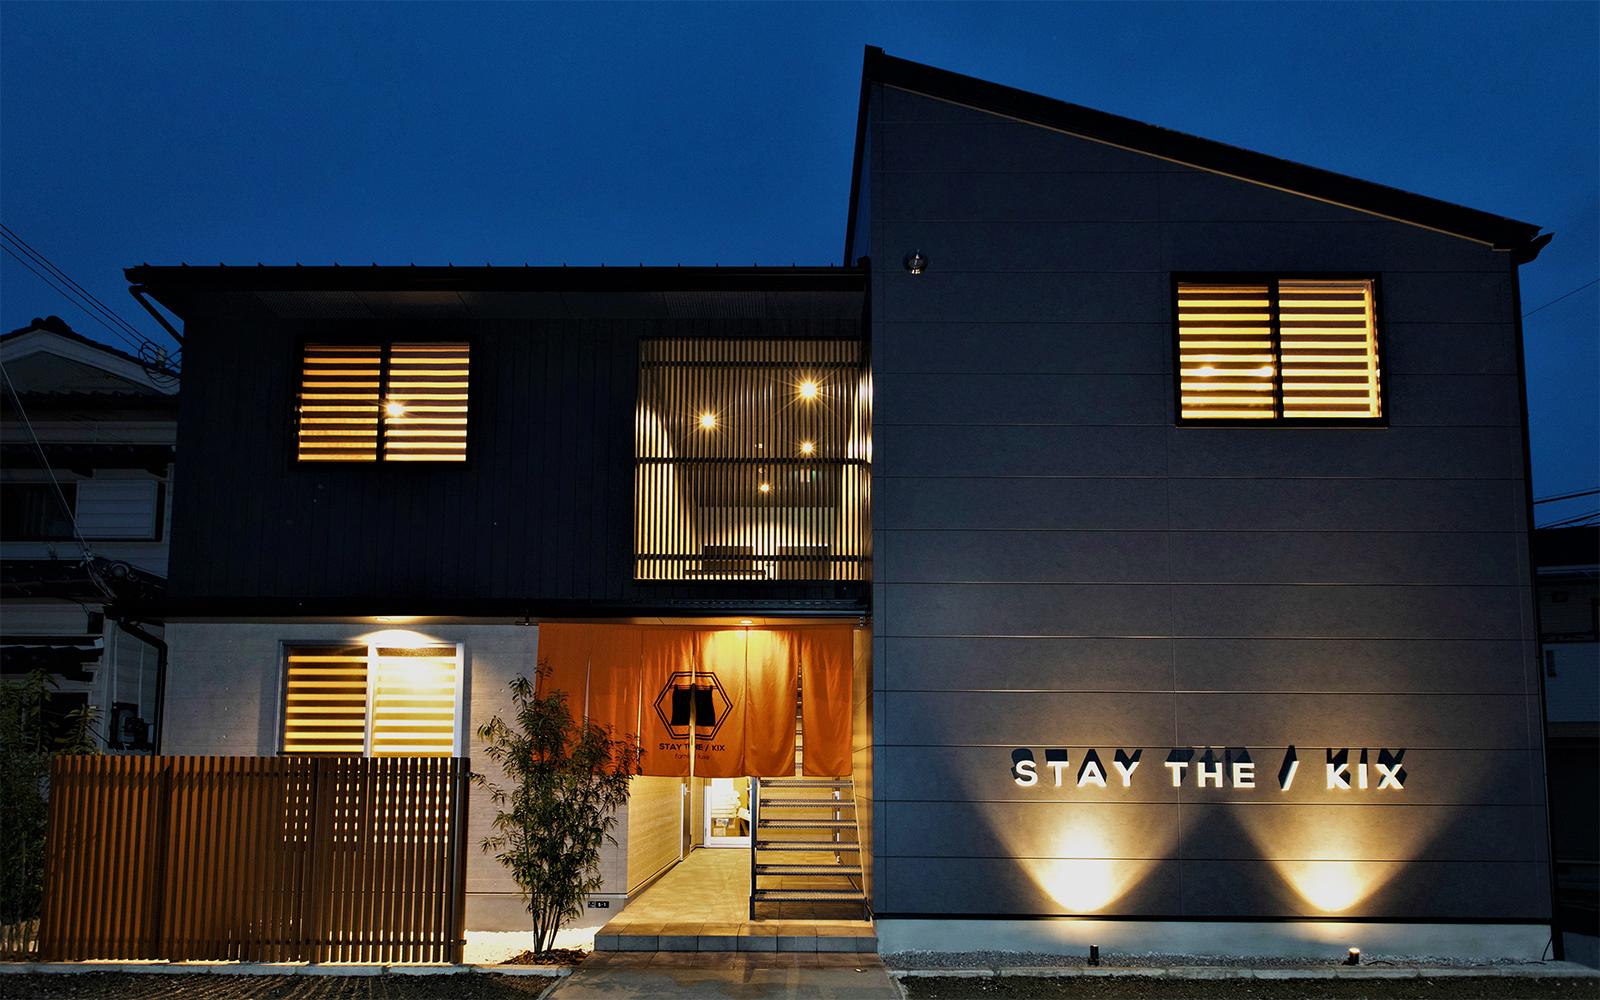 STAY THE KIX apartment hotel